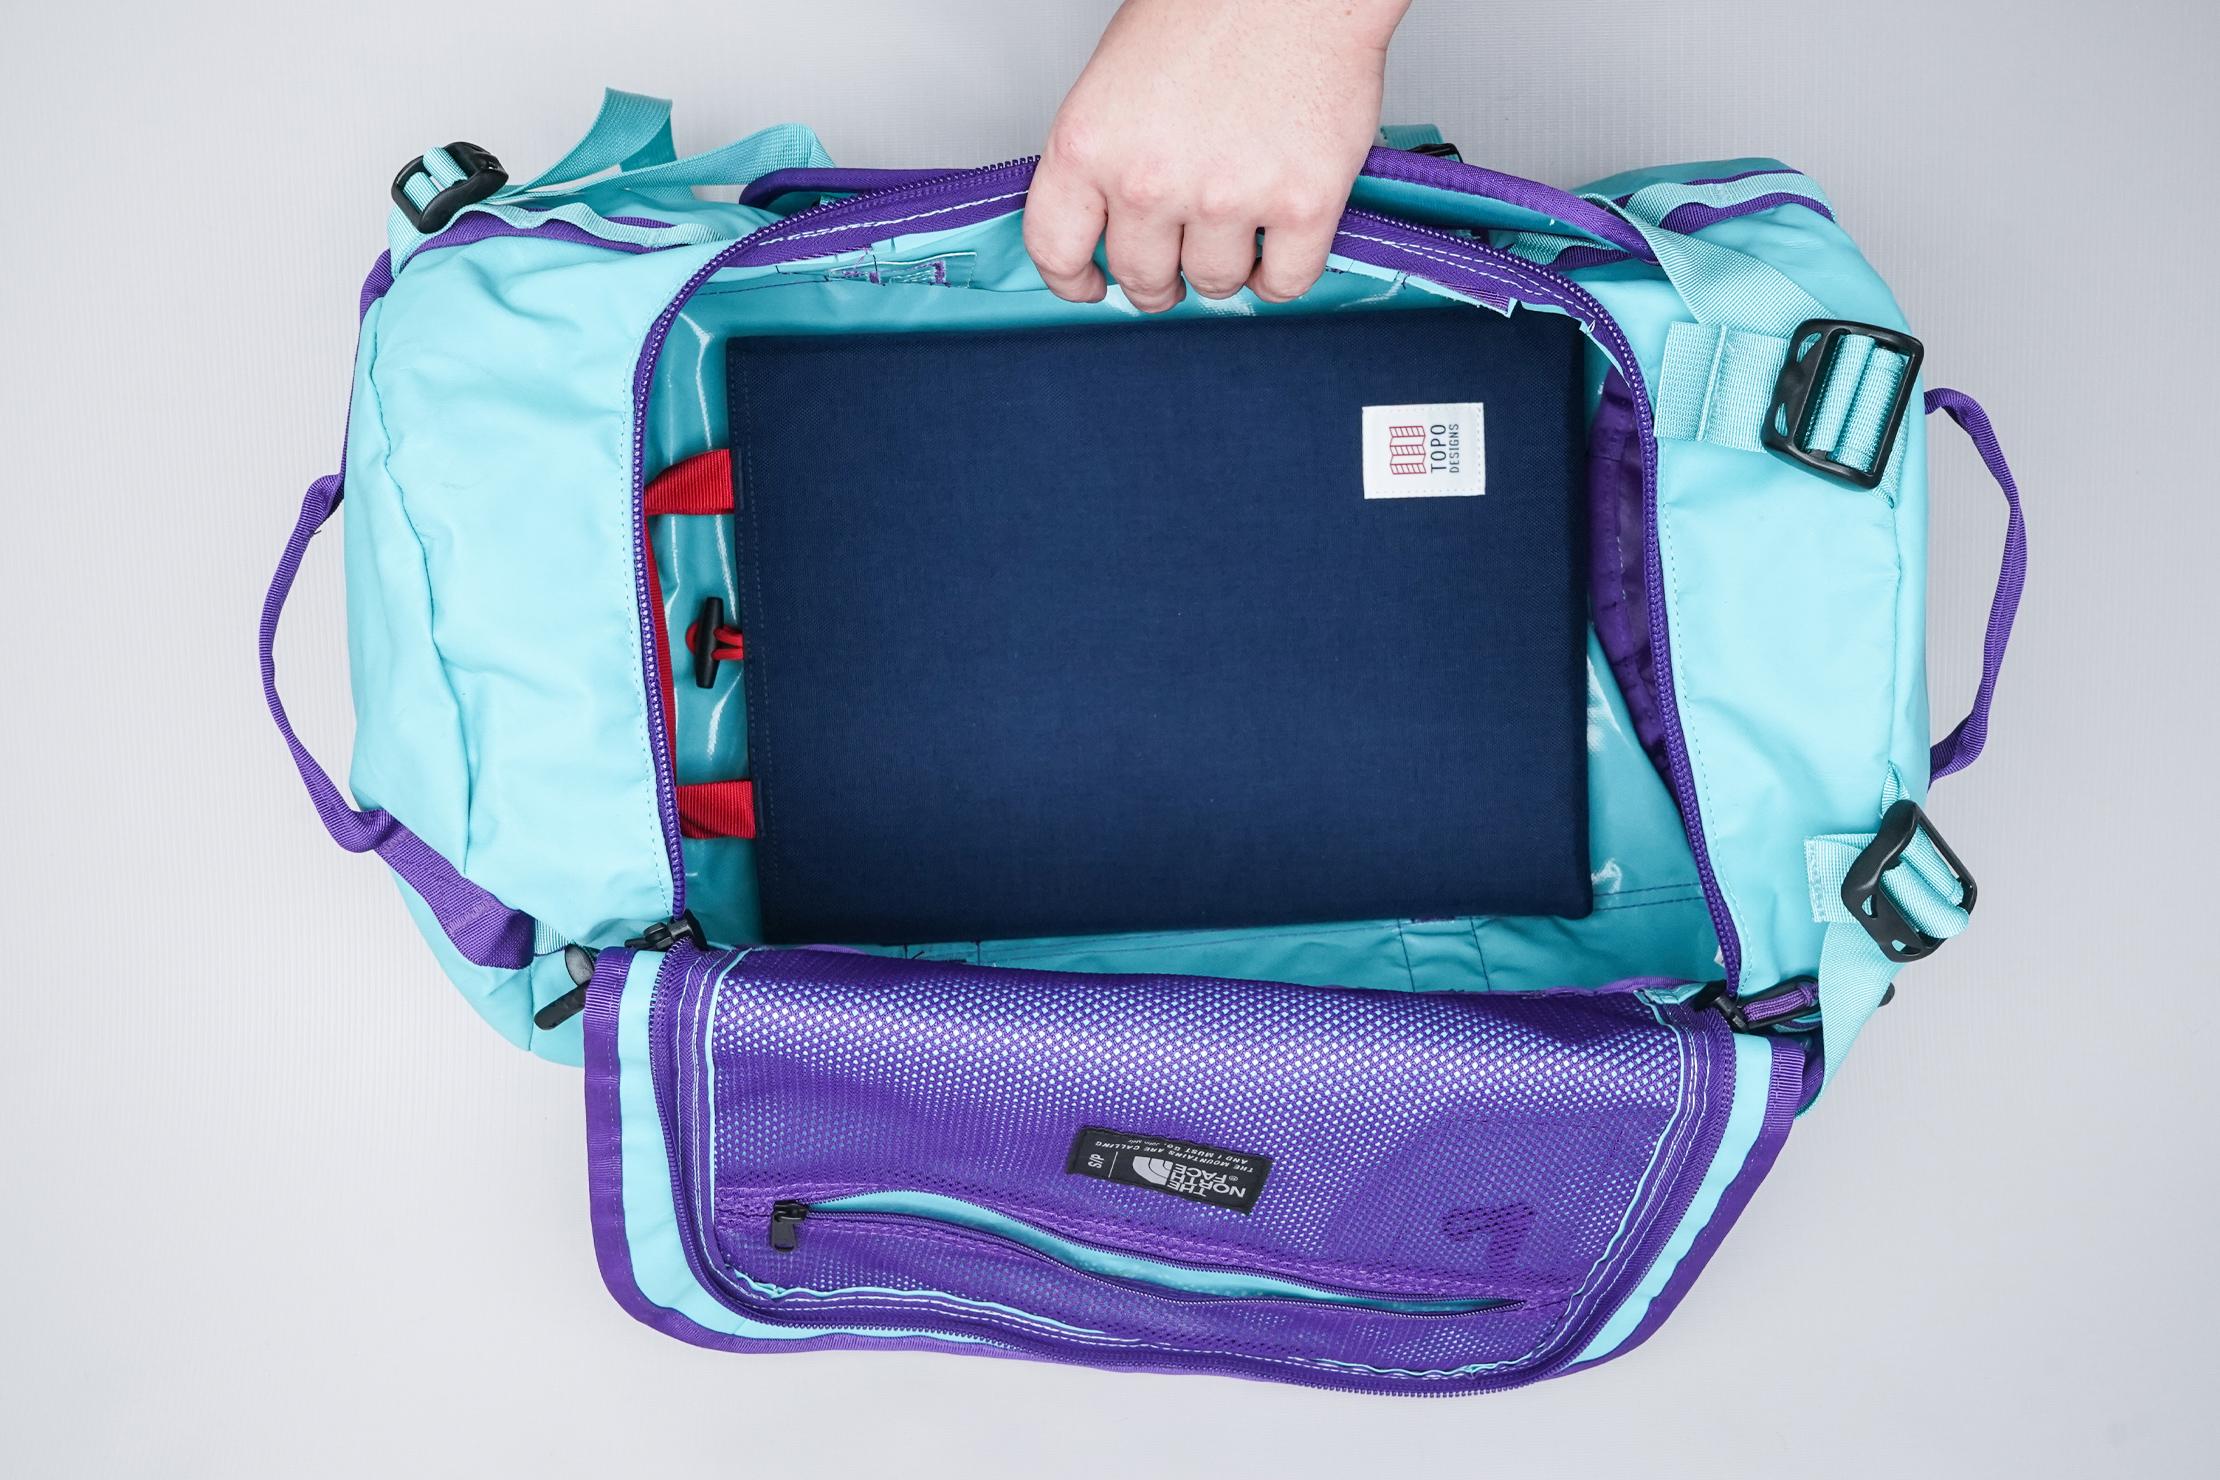 Topo Designs Laptop Sleeve Inside Bag